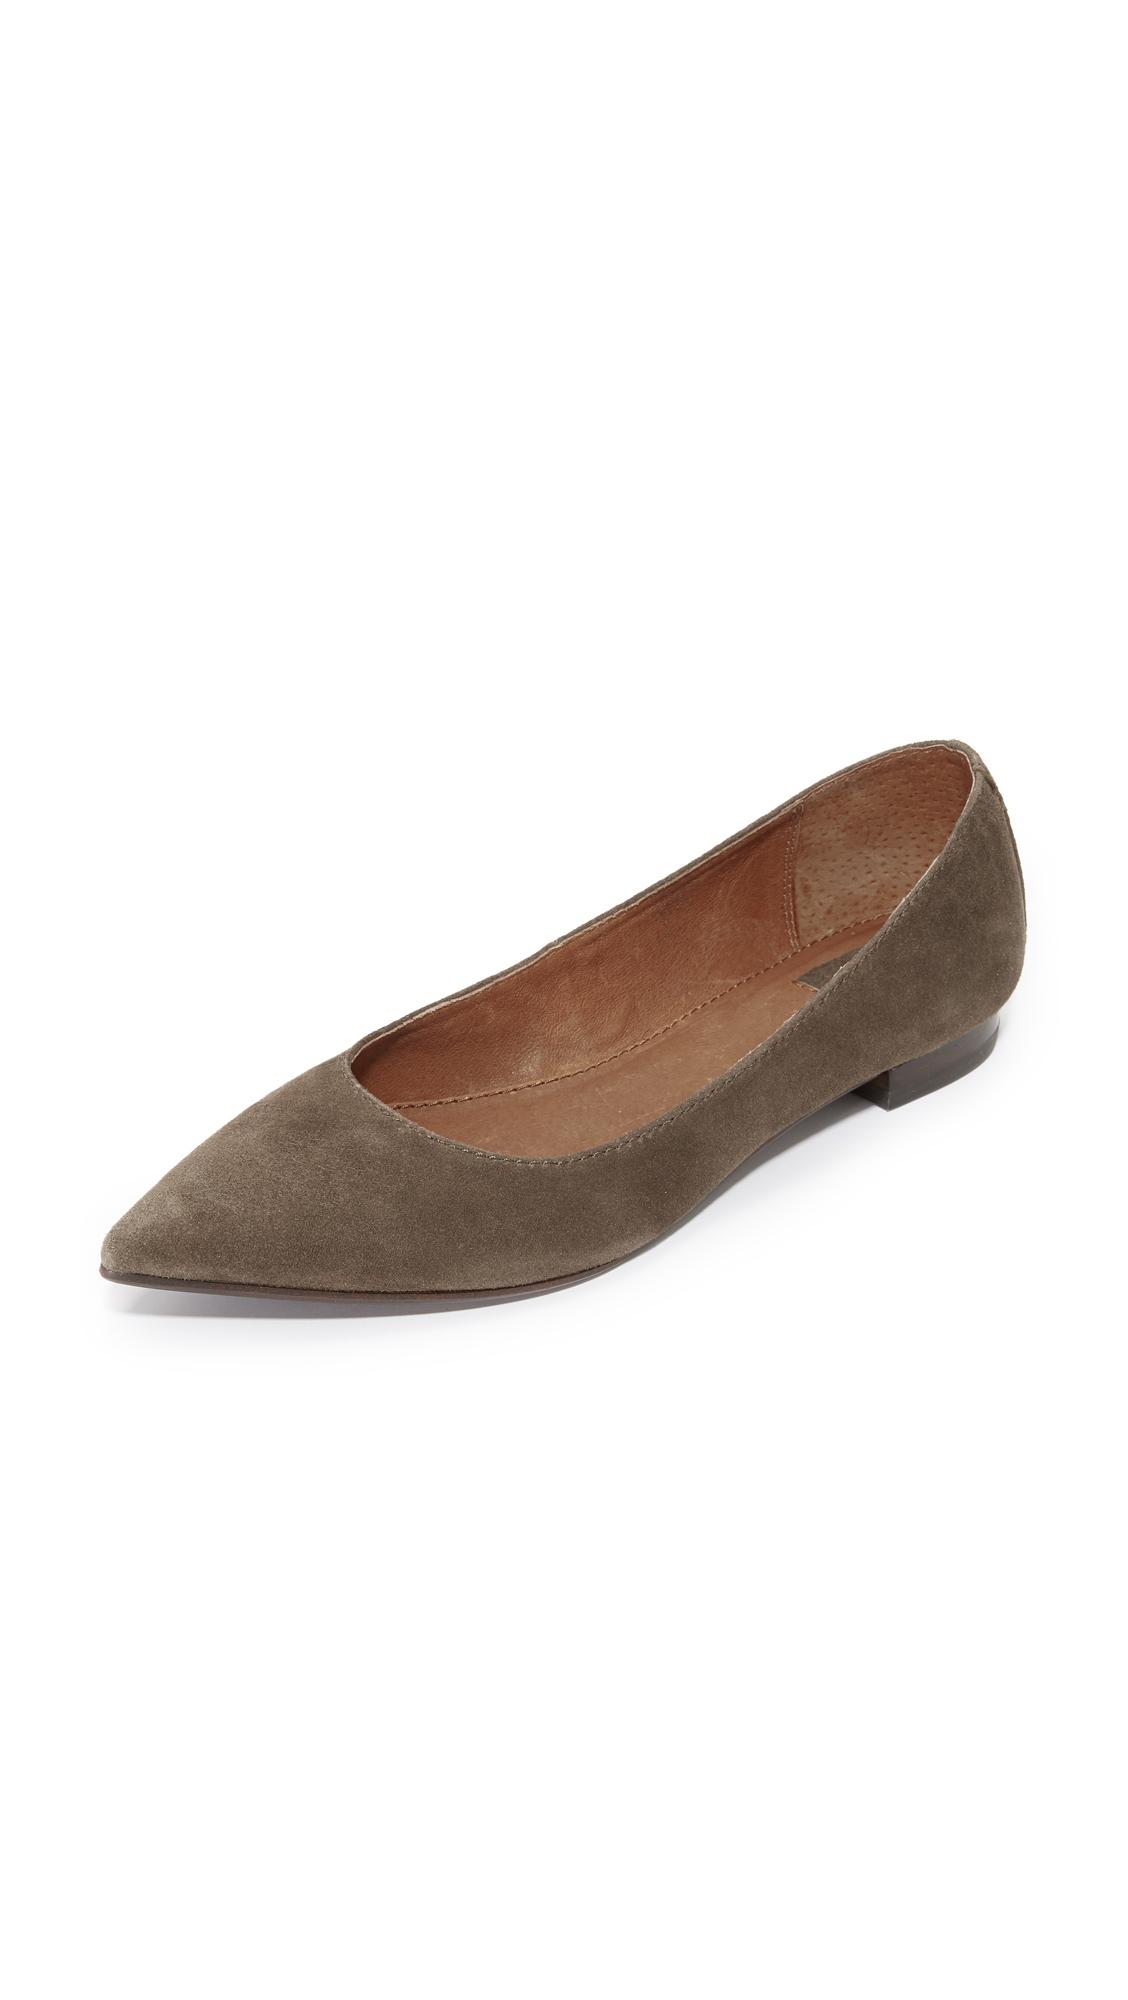 Frye Sienna Ballet Flats